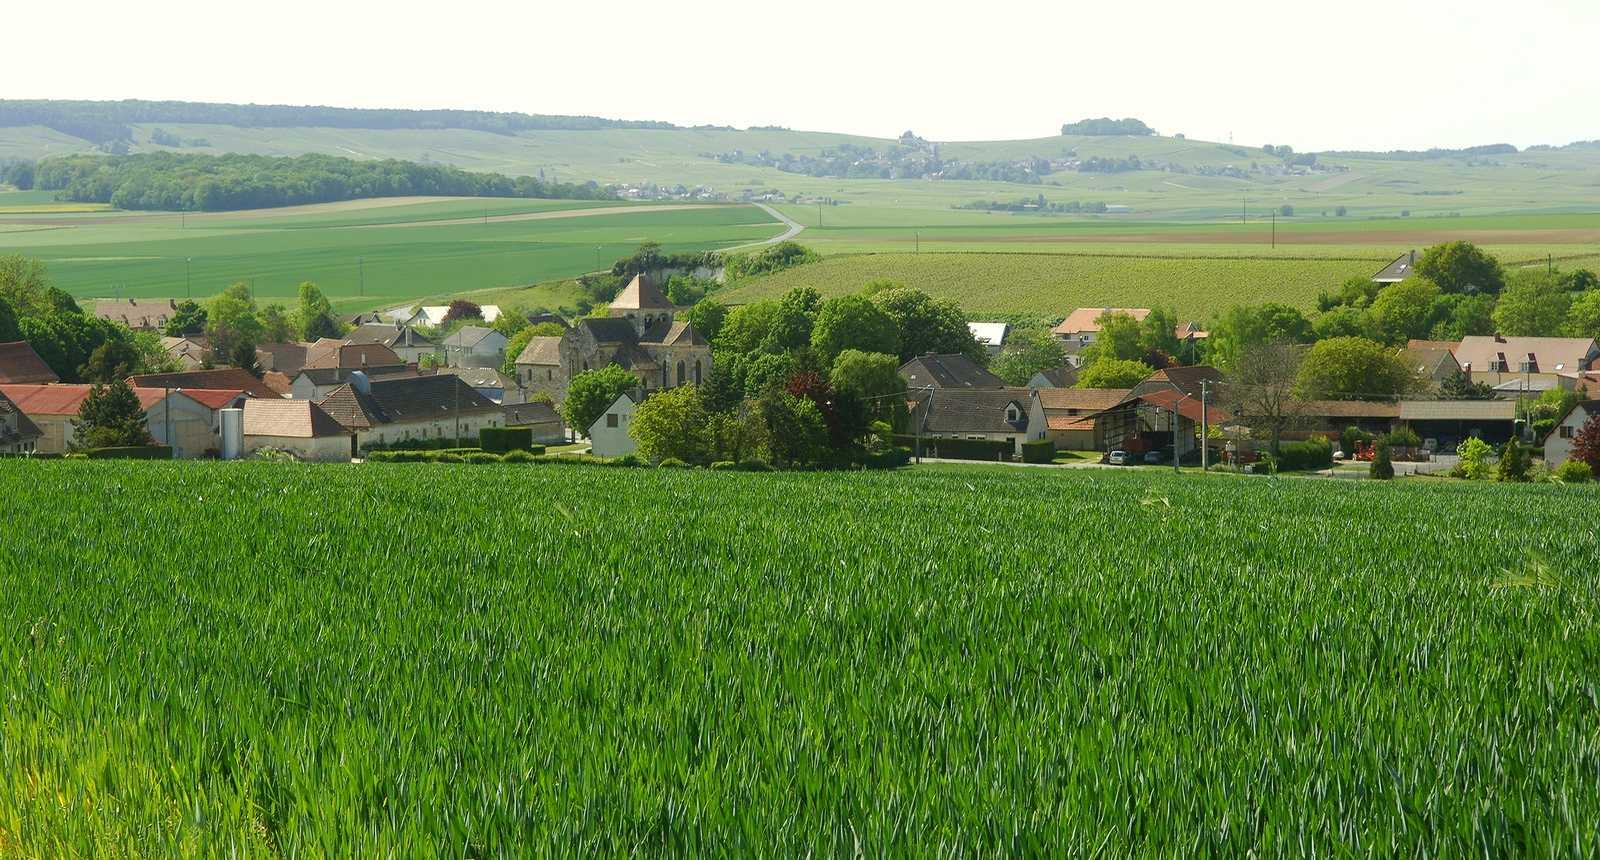 Villers-aux-Noeuds